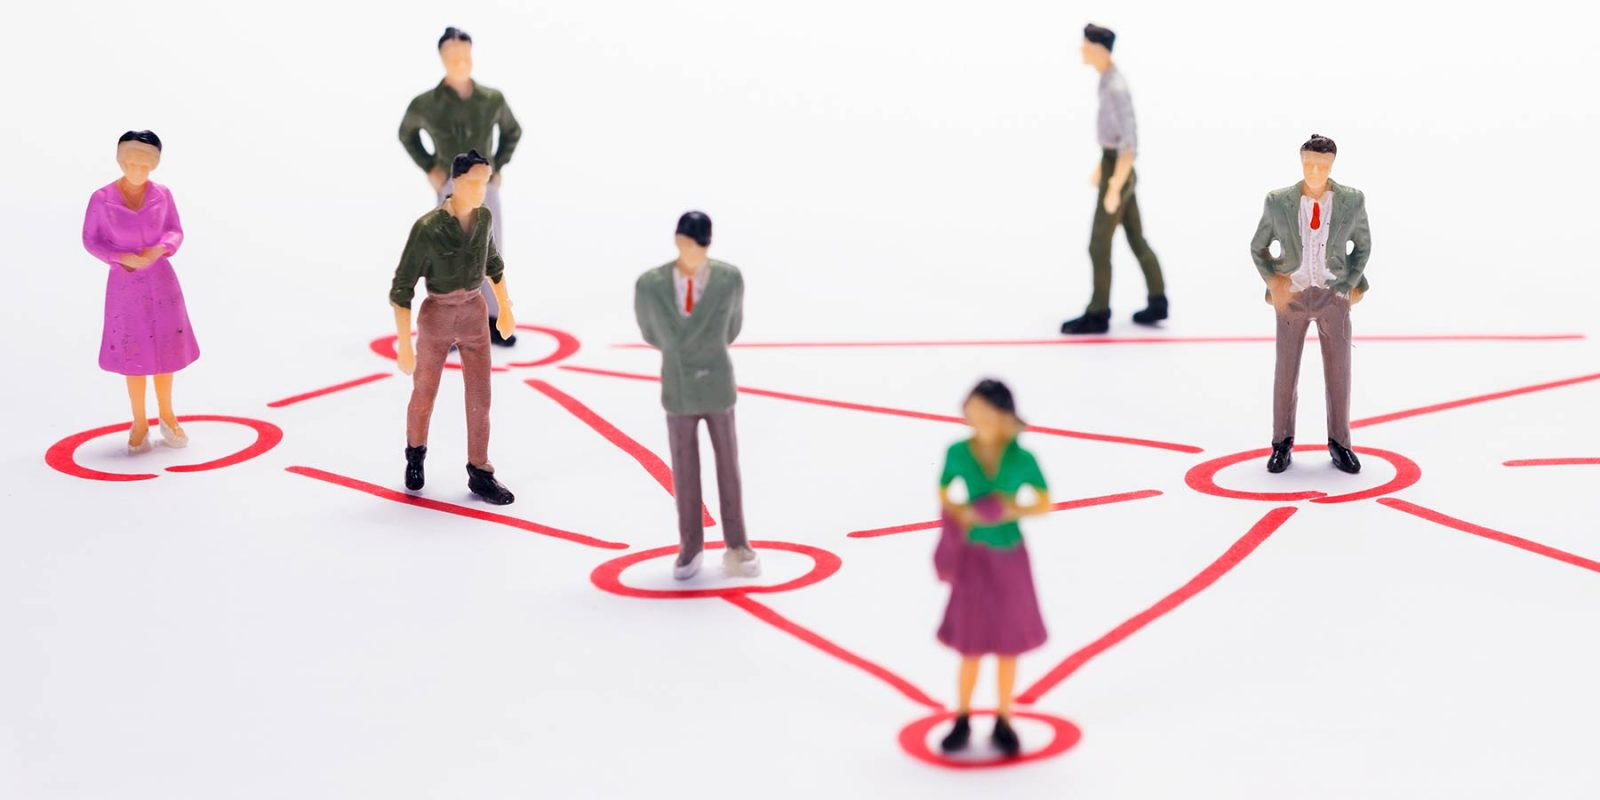 "Konzeptfoto ""Team"" mit Miniaturfiguren"